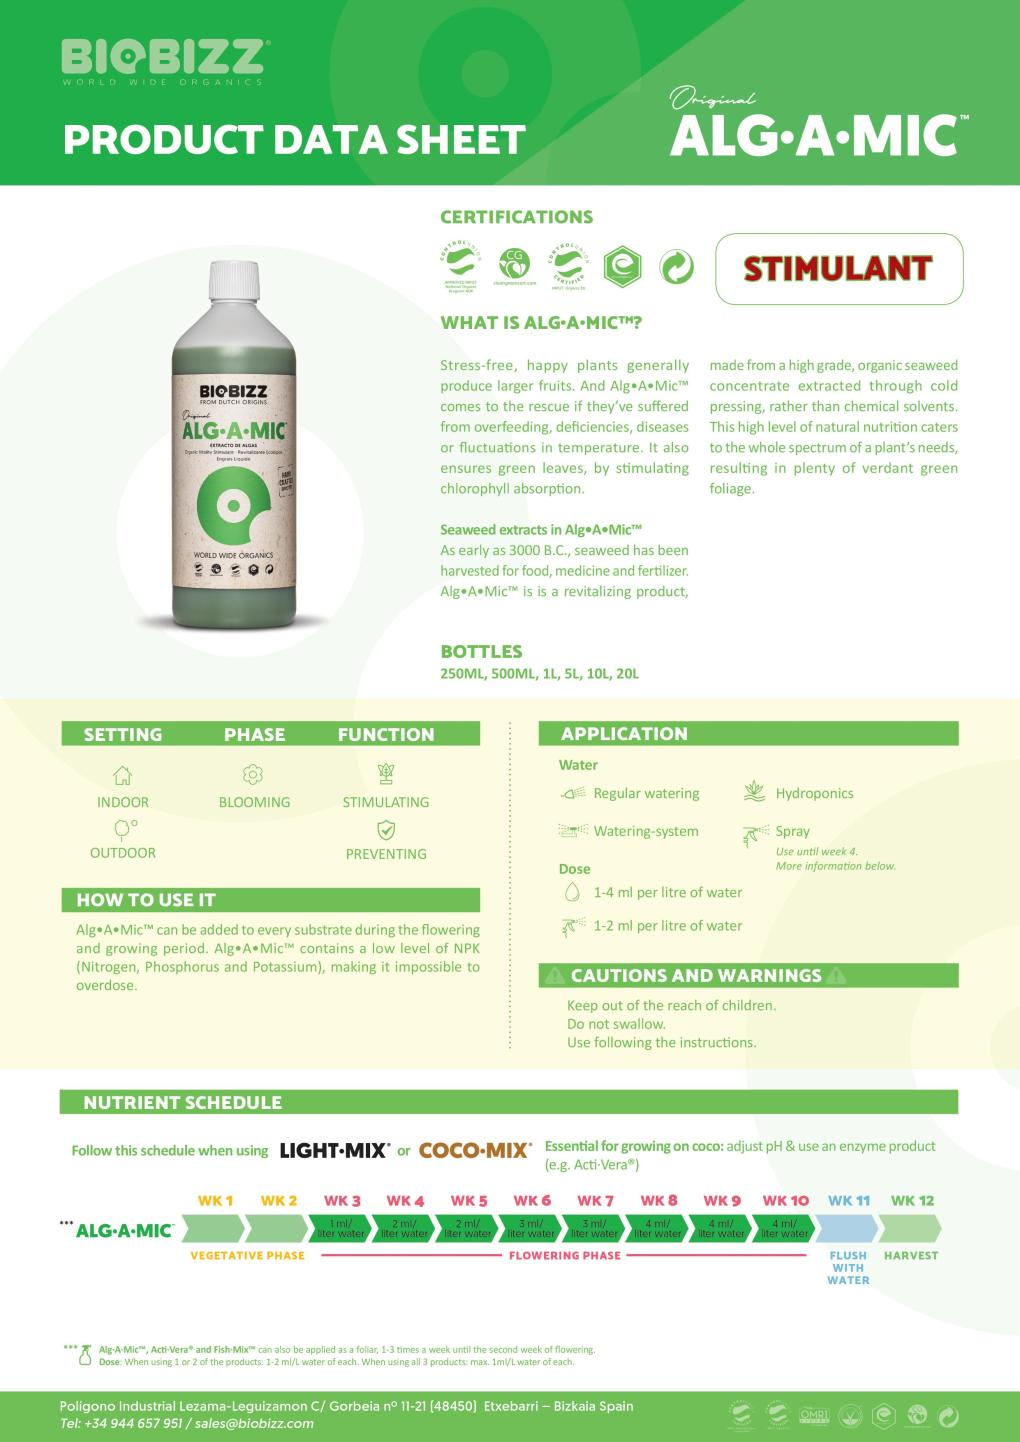 Biobizz Alg-A-Mic Product Data Sheet 2020